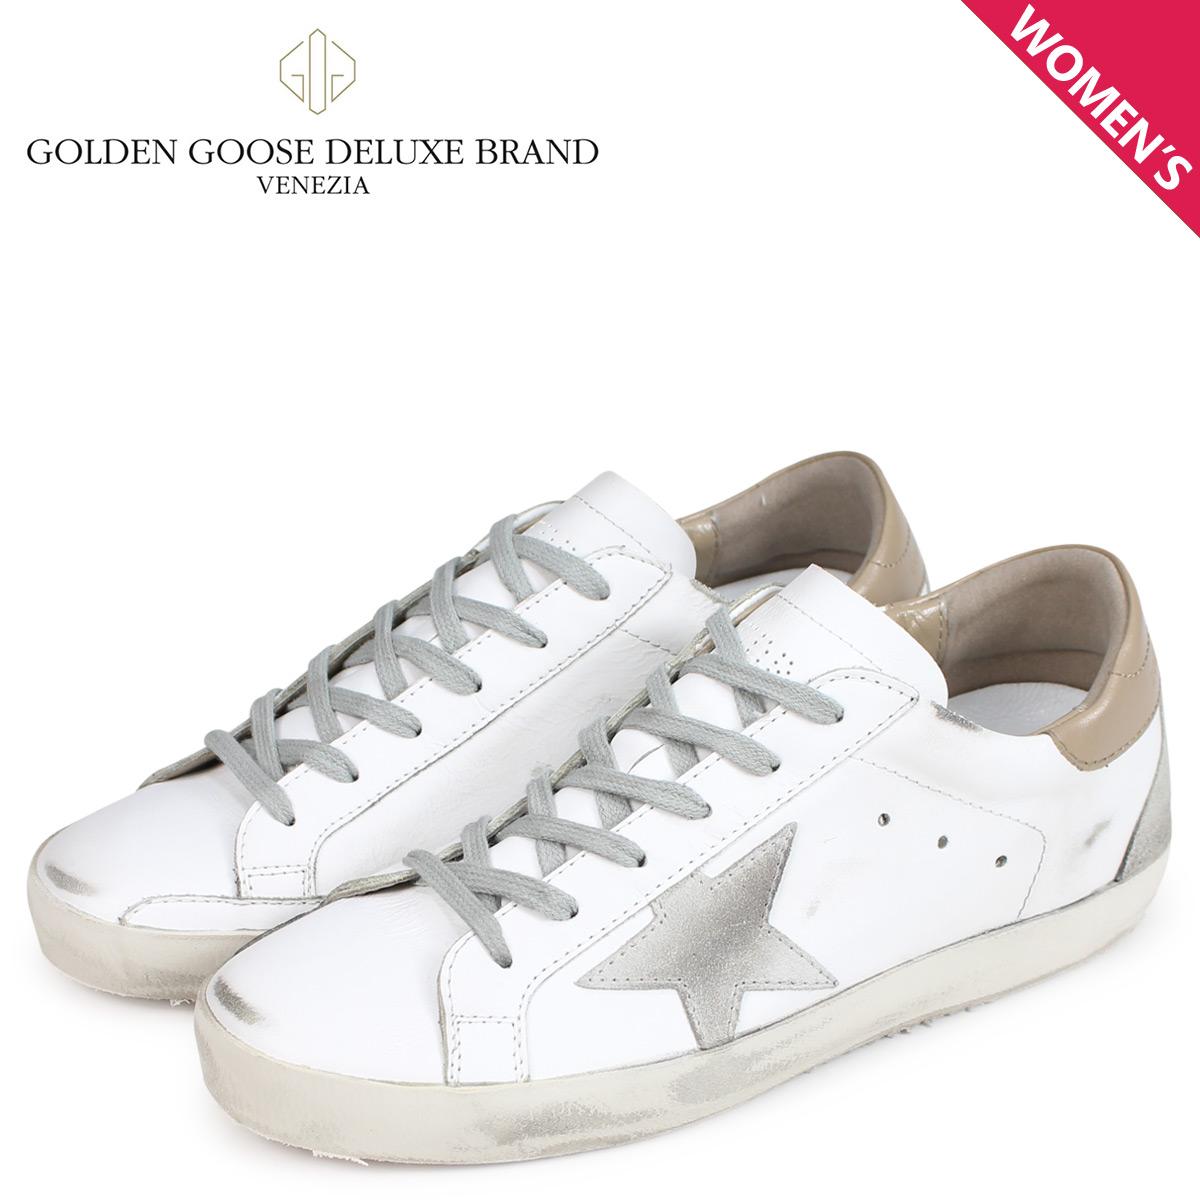 Golden Goose ゴールデングース スニーカー レディース スーパースター SNEAKERS SUPERSTAR ホワイト 白 G33WS590 H20